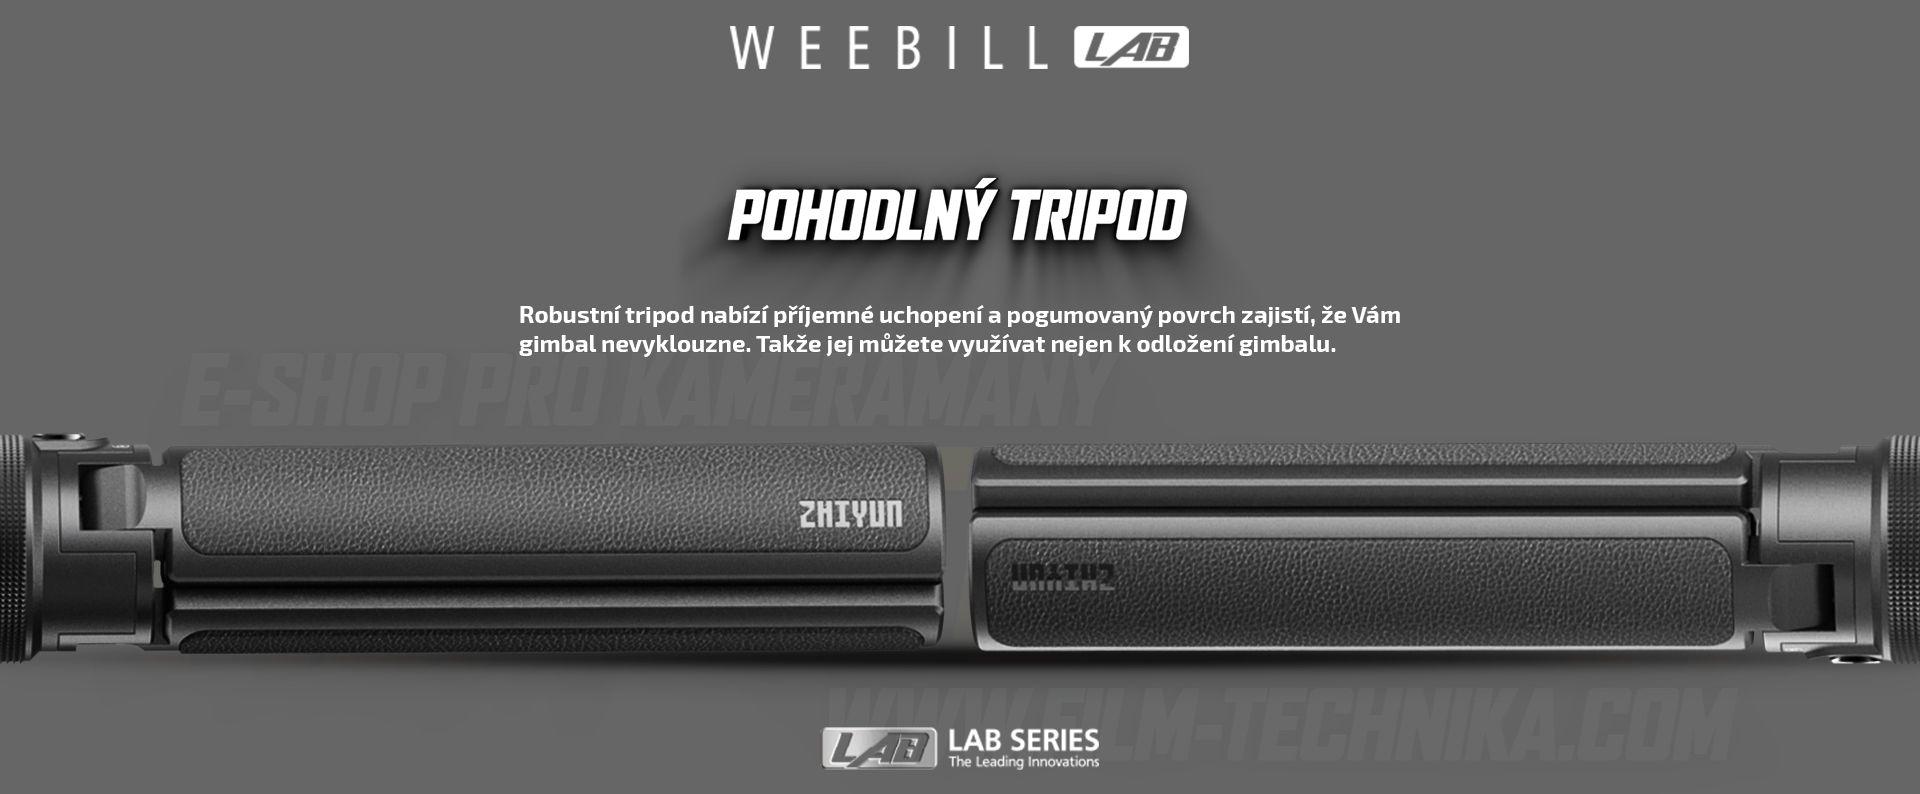 film-technika-zhiyun-weebill-lab-intext2